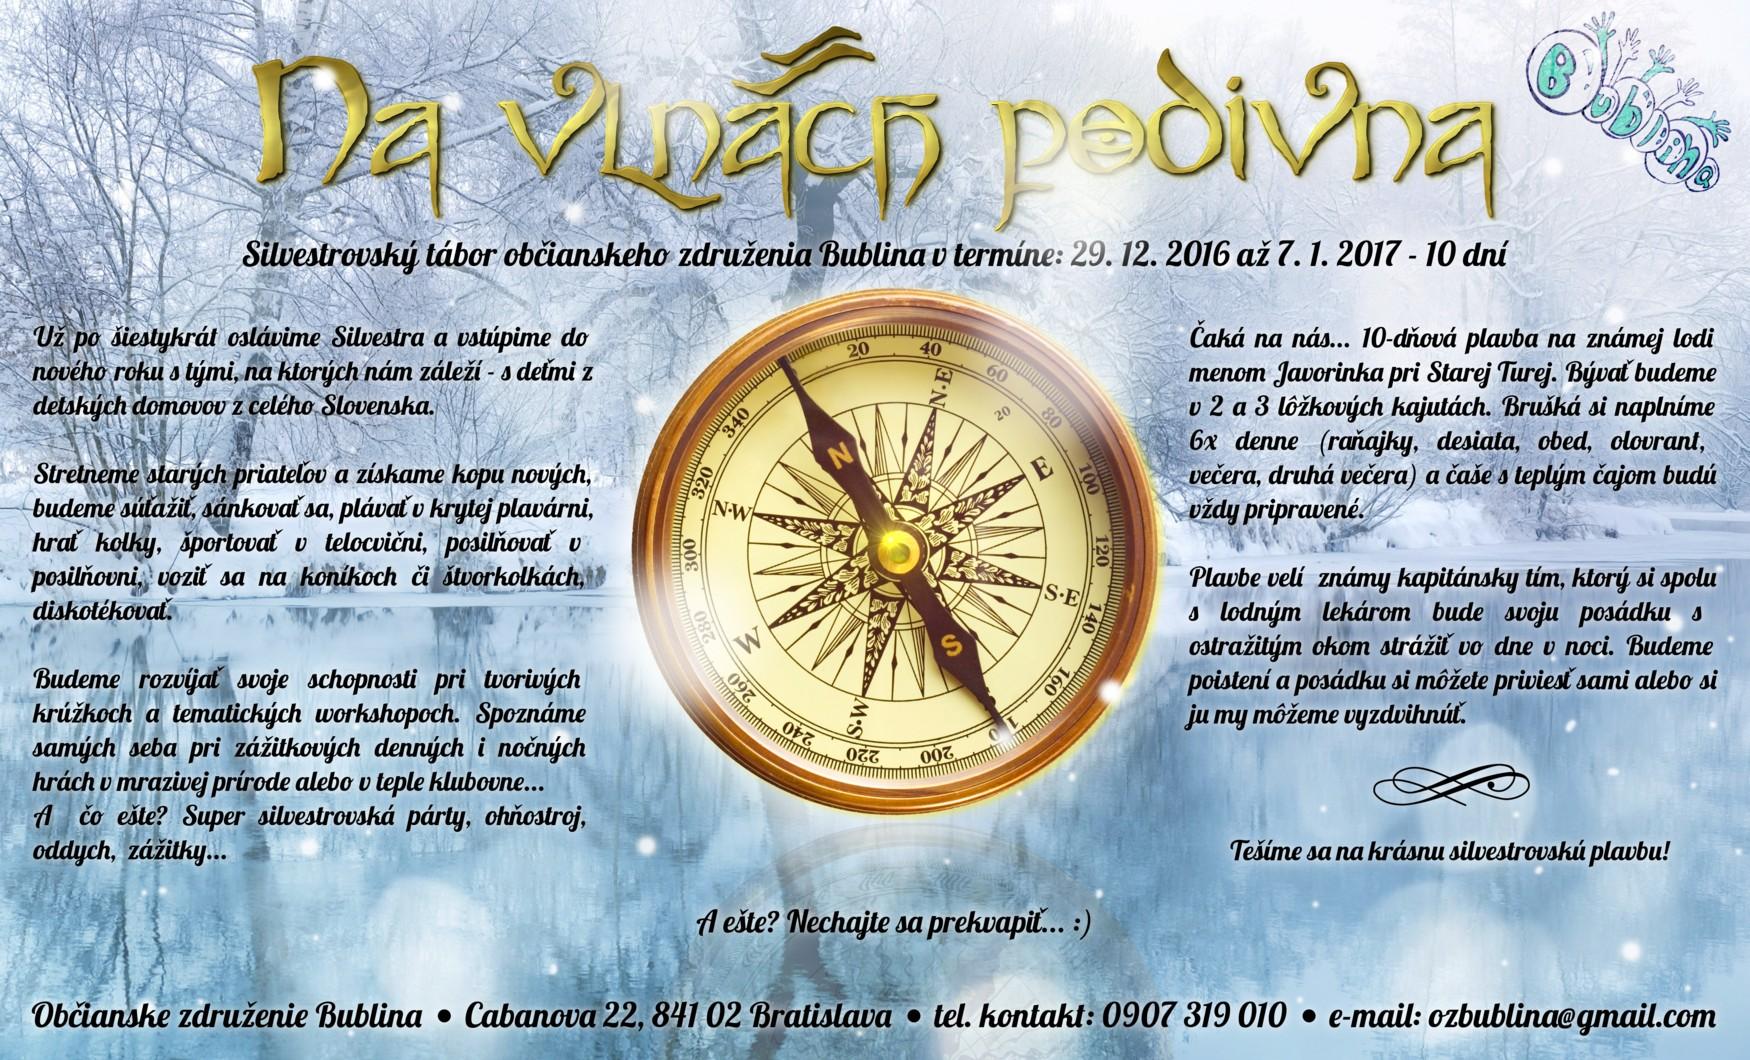 ponuka-silvestrovsky-tabor-na-vlnach-podivna-2016-2017